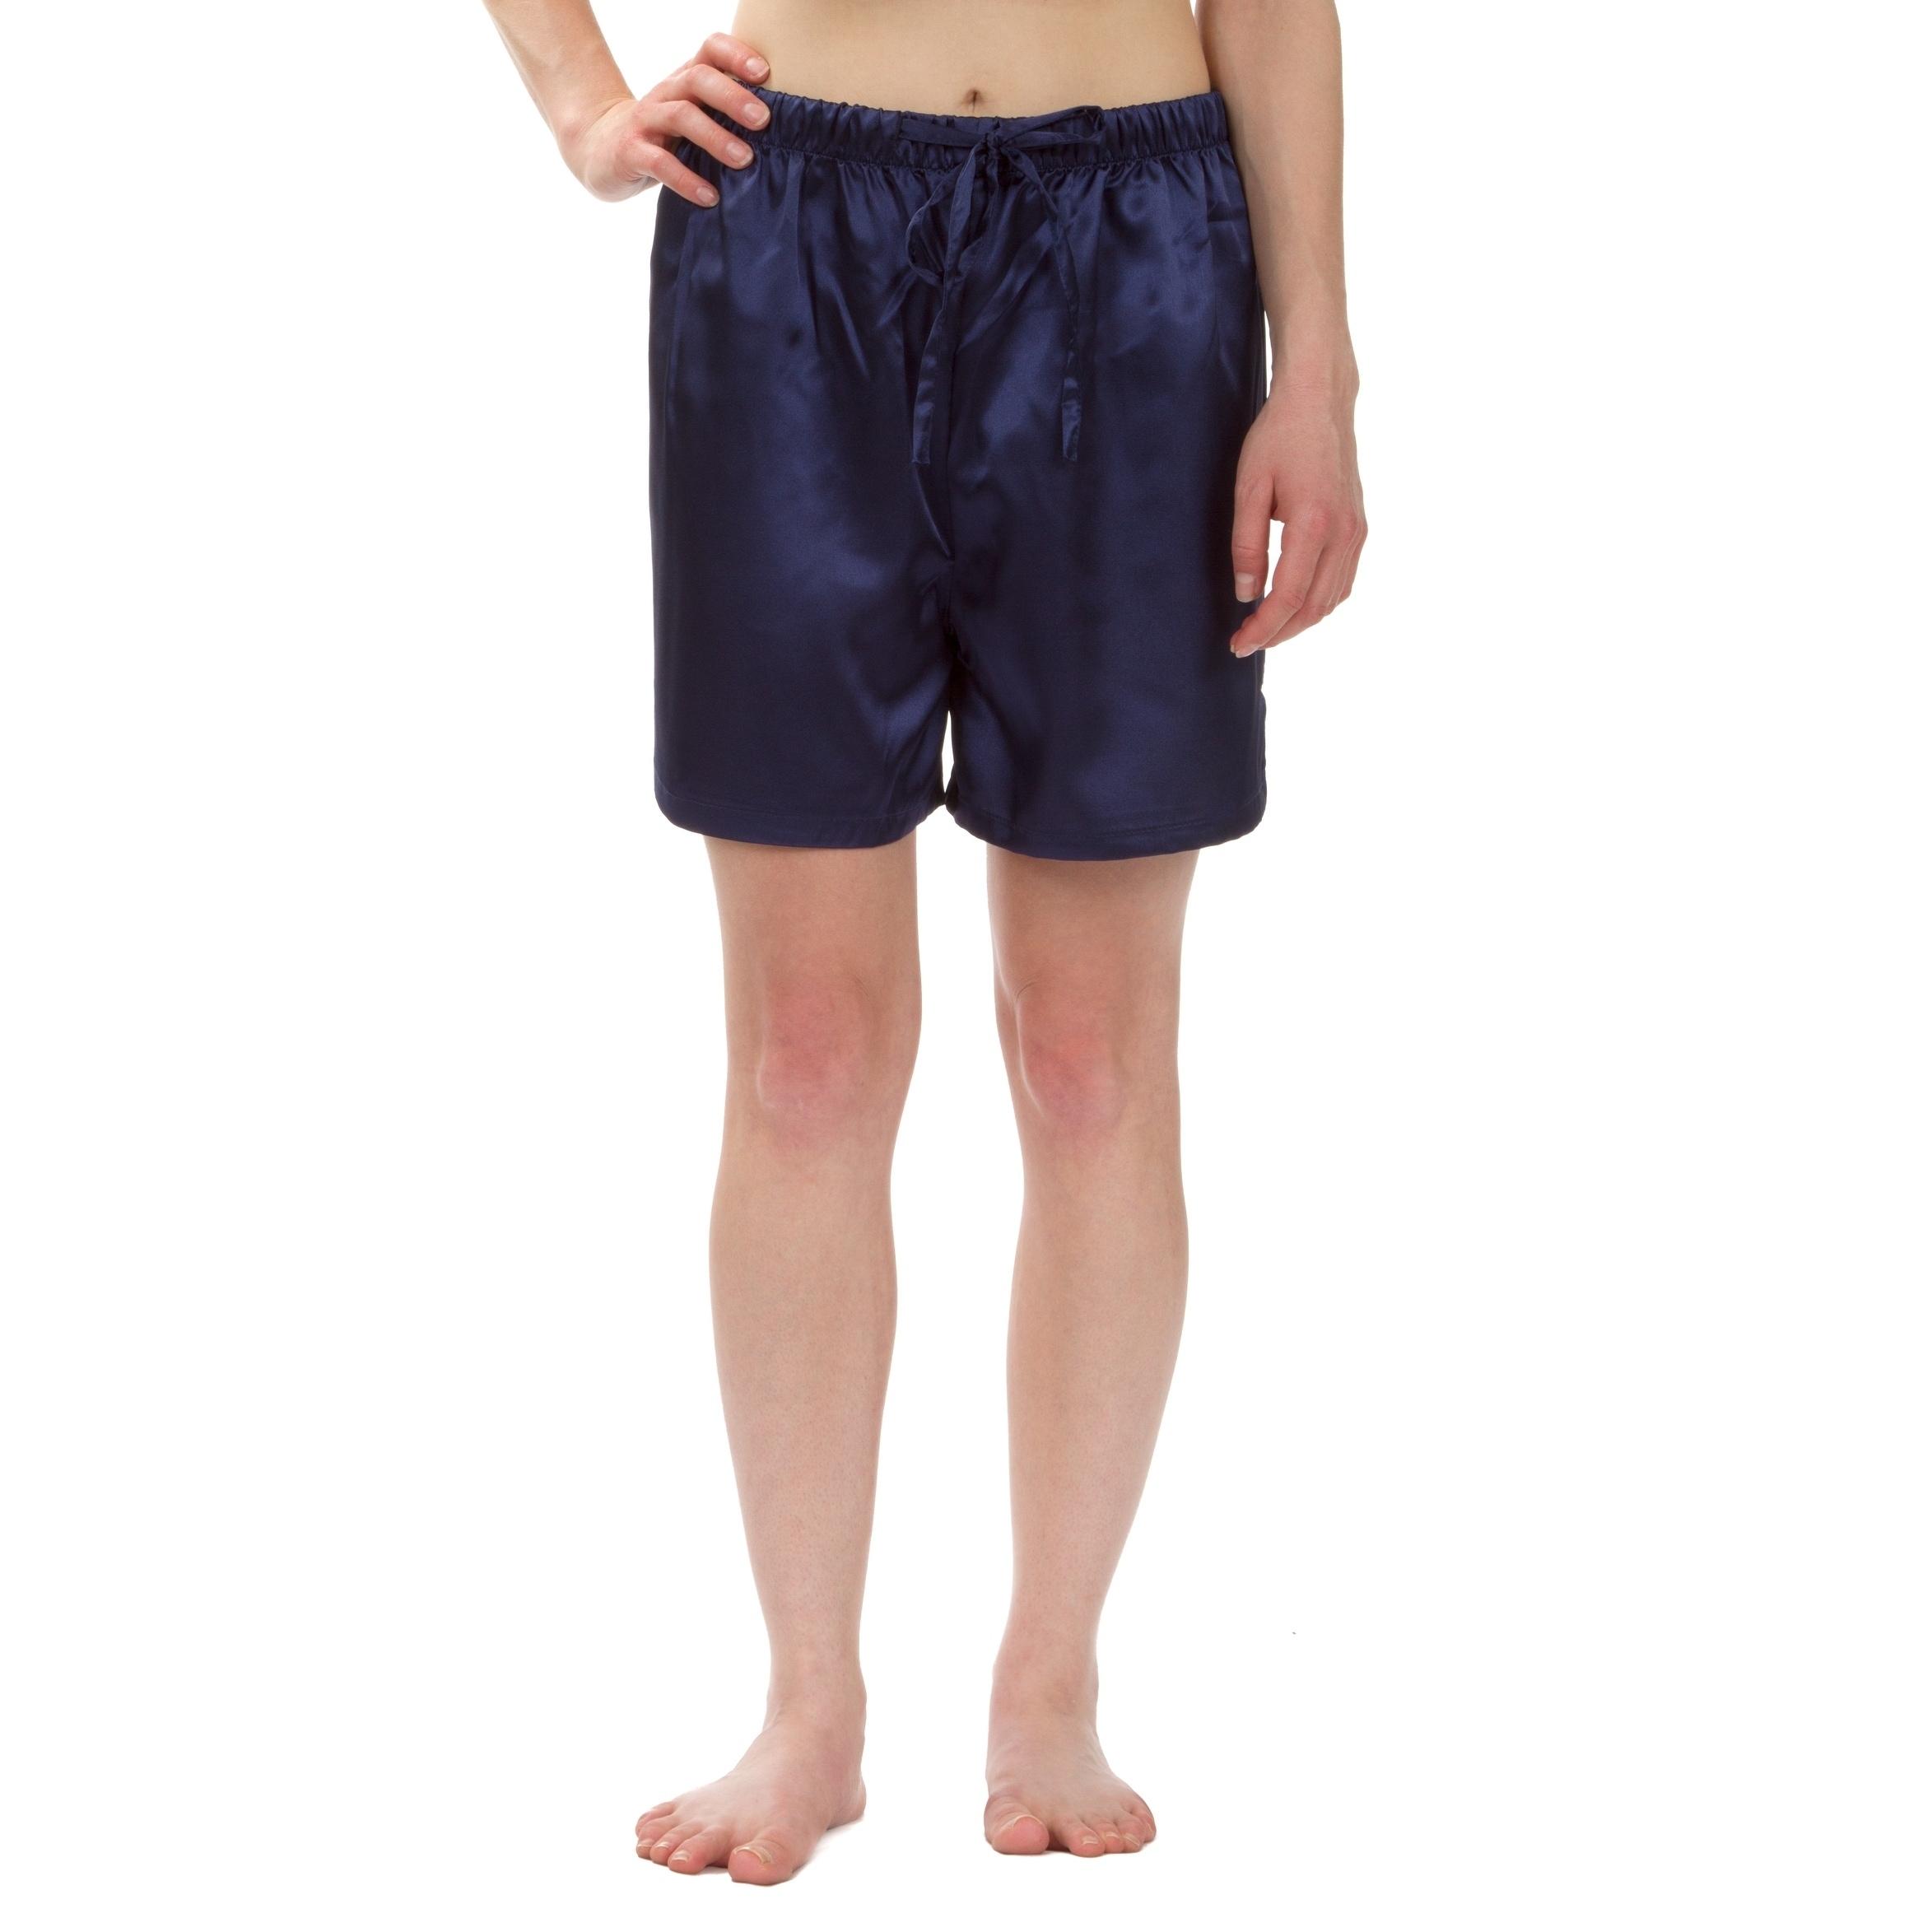 Leisureland Women's Stretch Satin Pajama Boxer Shorts (Na...